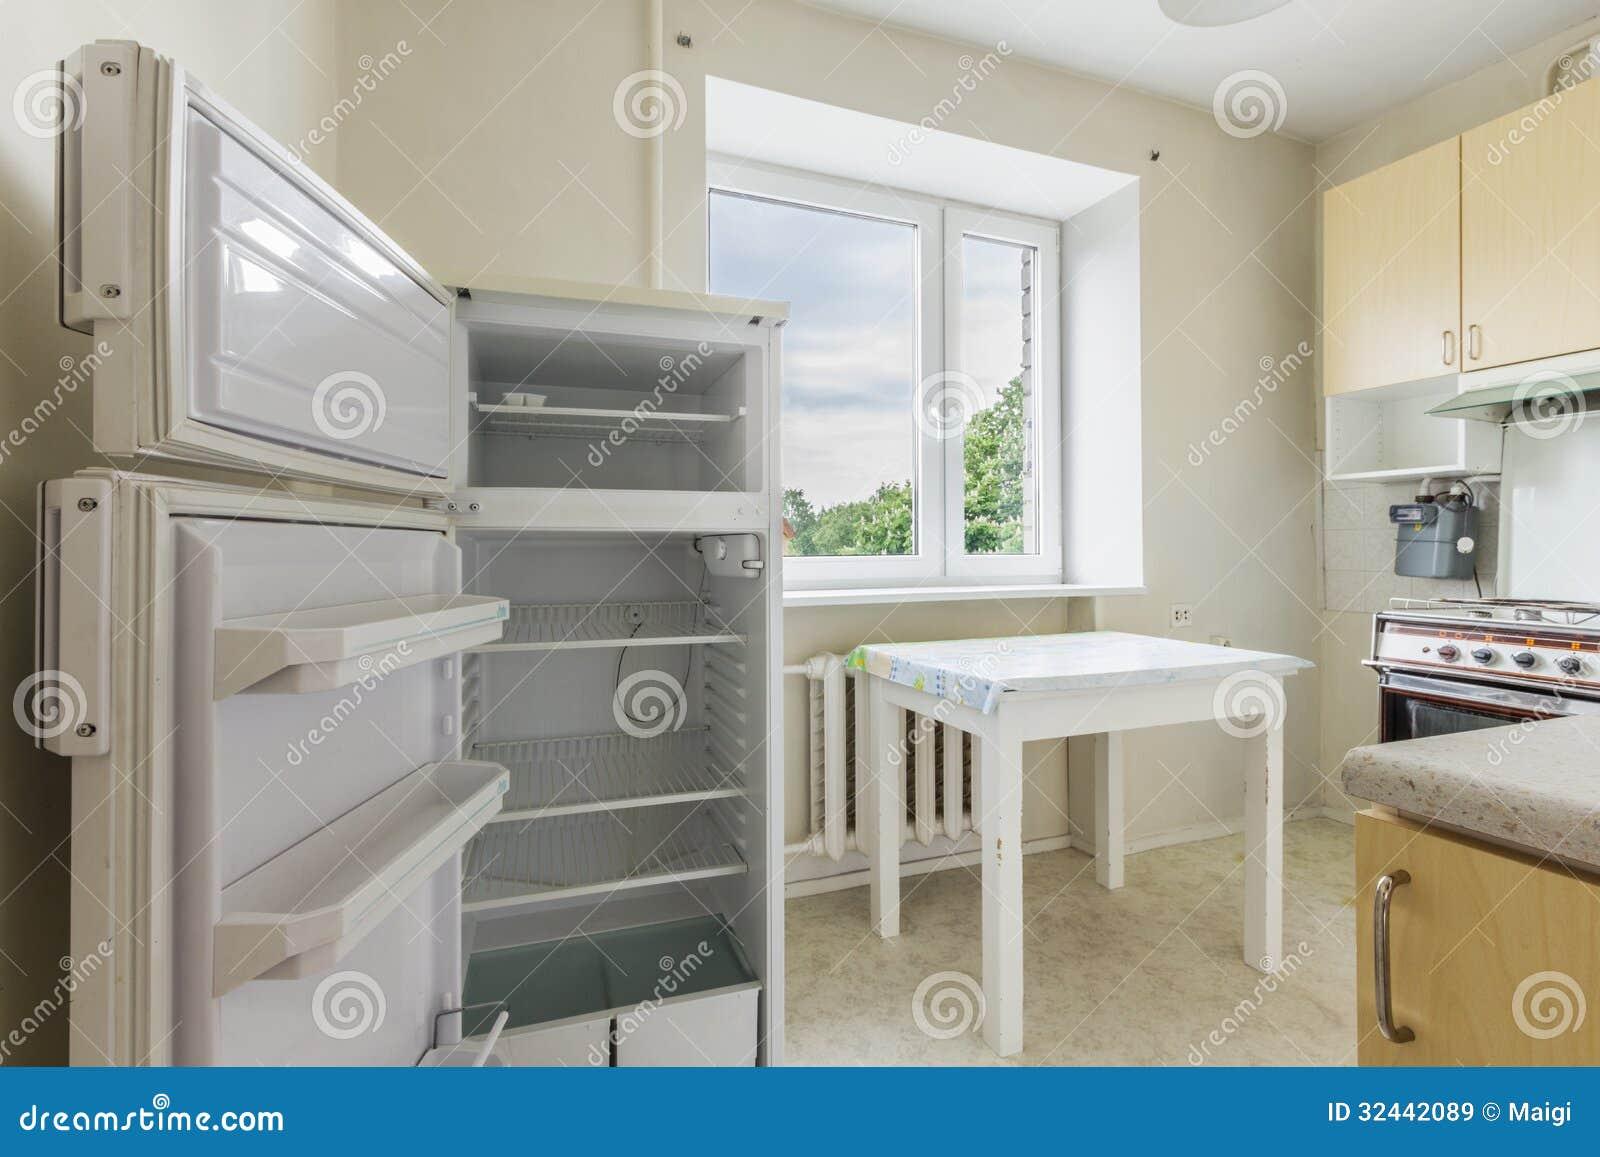 Download Kitchen stock image. Image of interior, fridge, move - 32442089